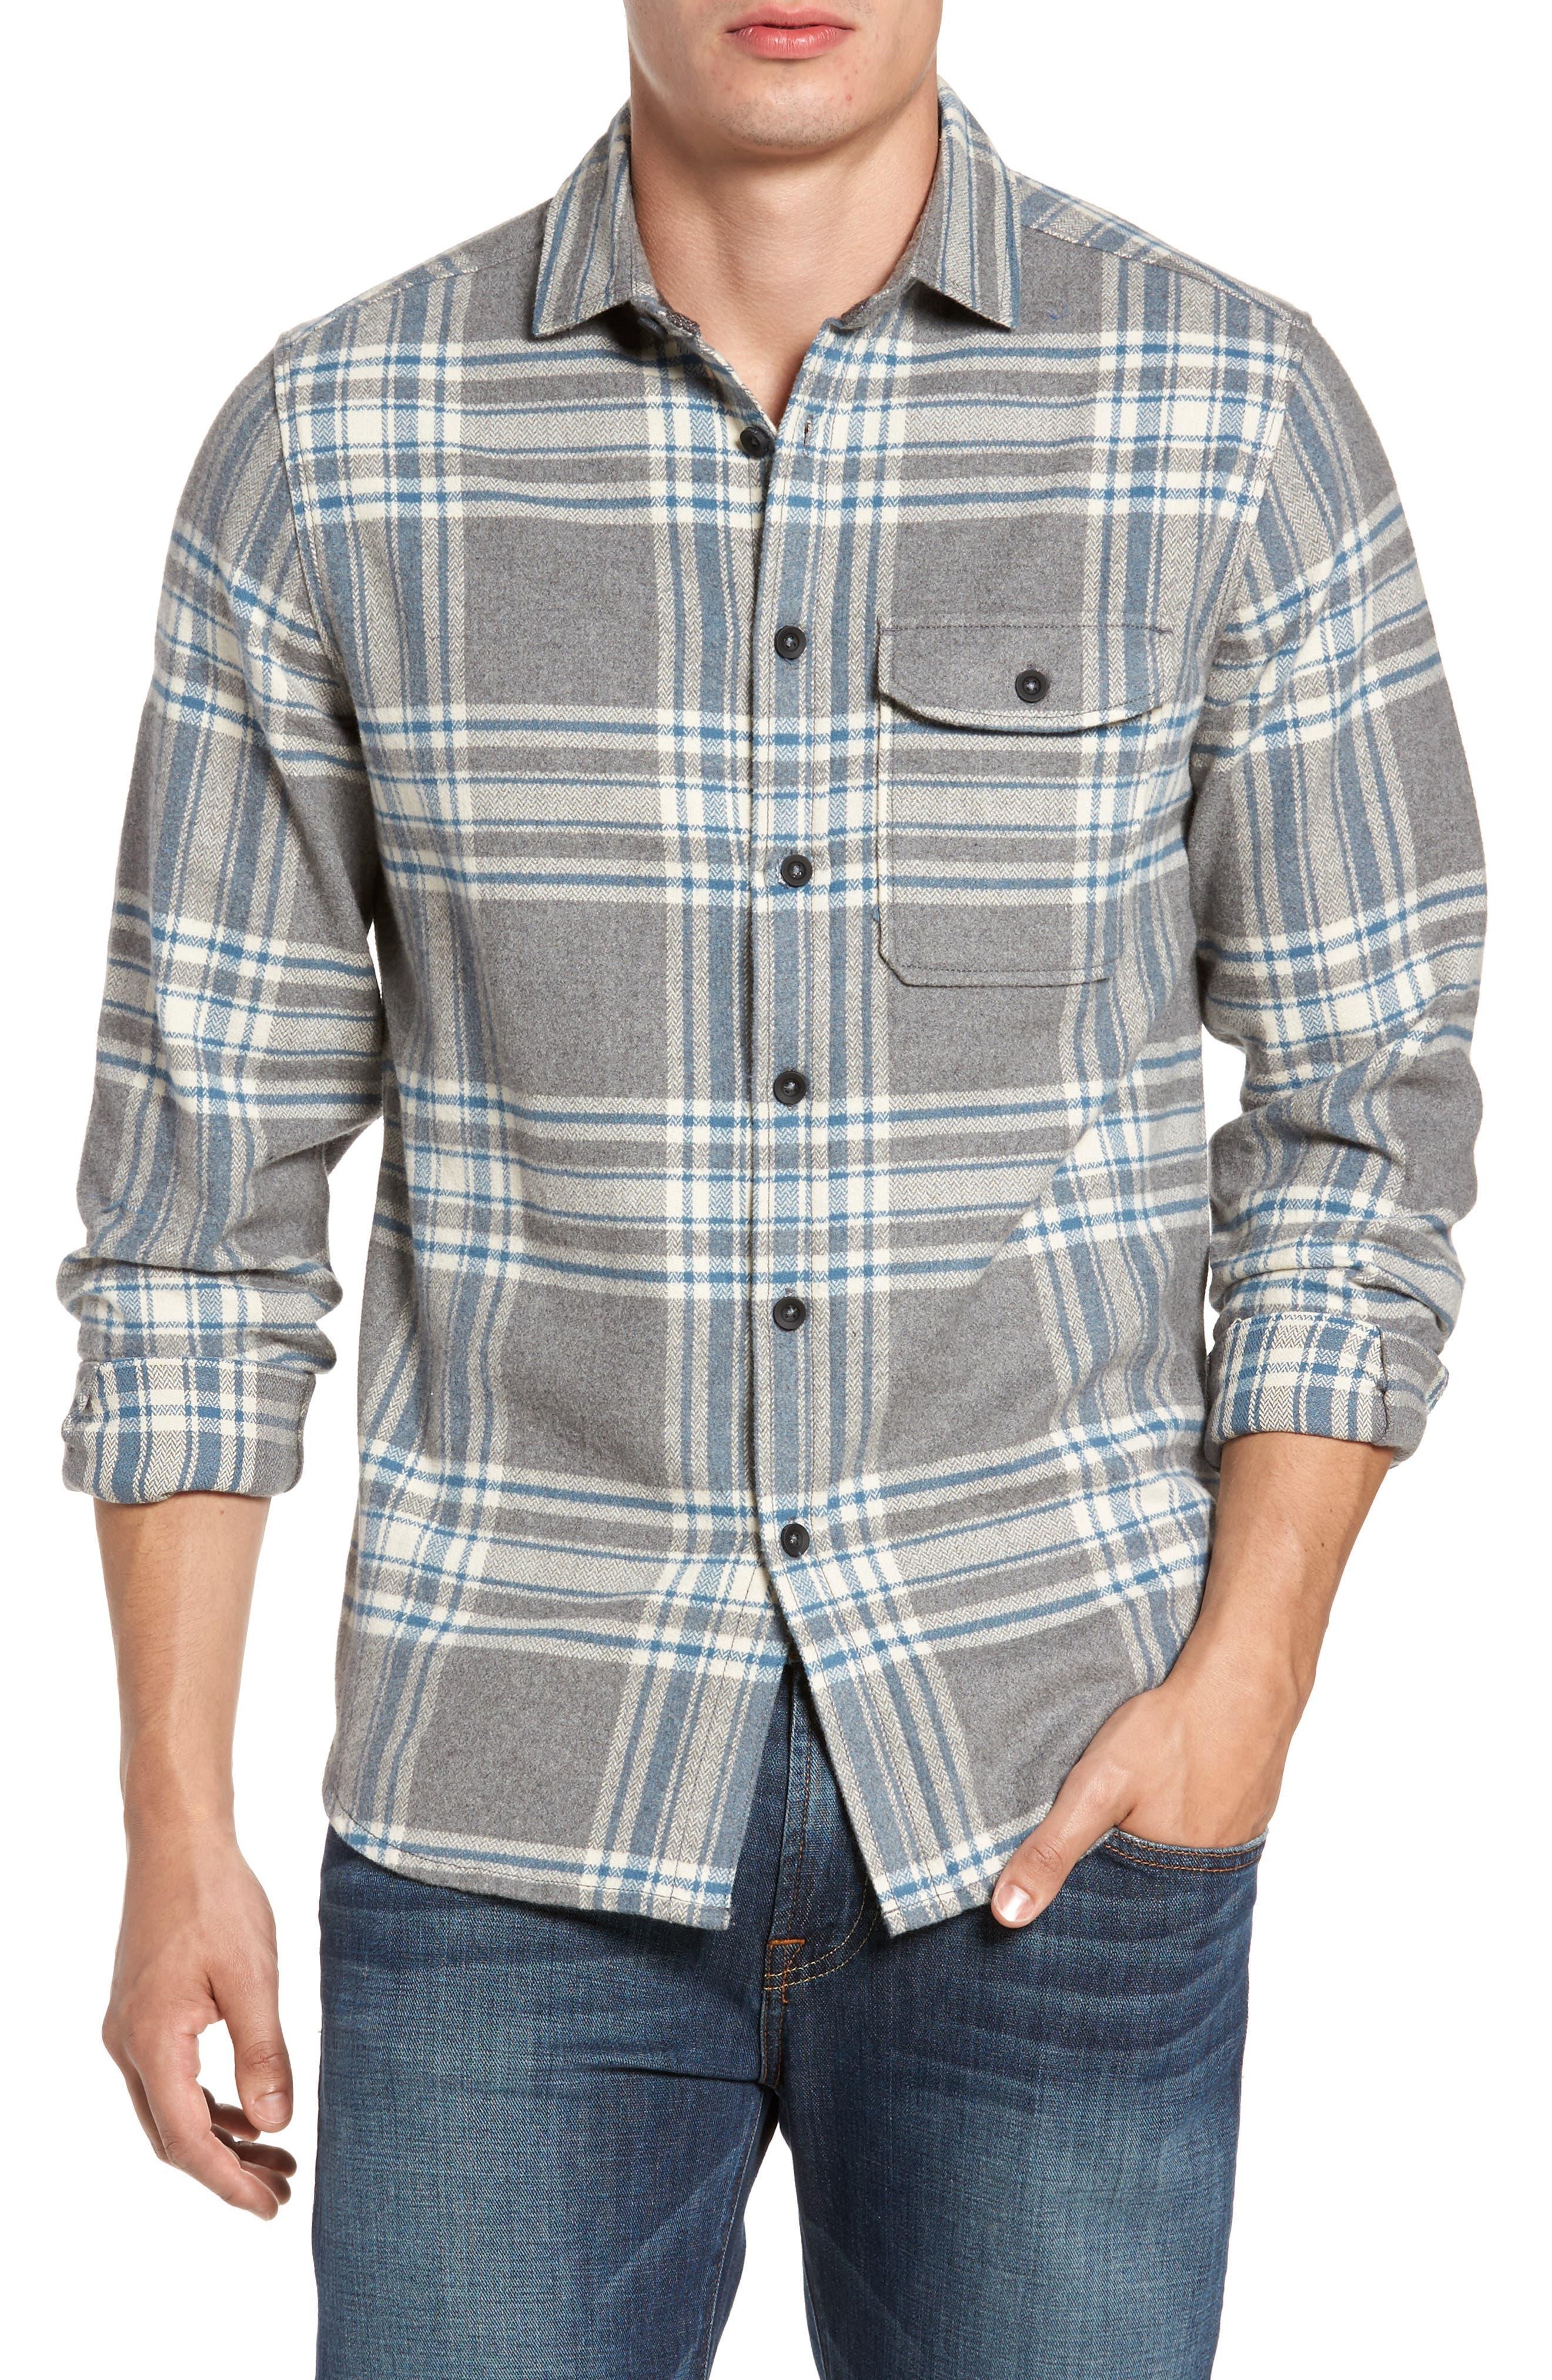 Alternate Image 1 Selected - Jeremiah Marin Herringbone Plaid Flannel Shirt